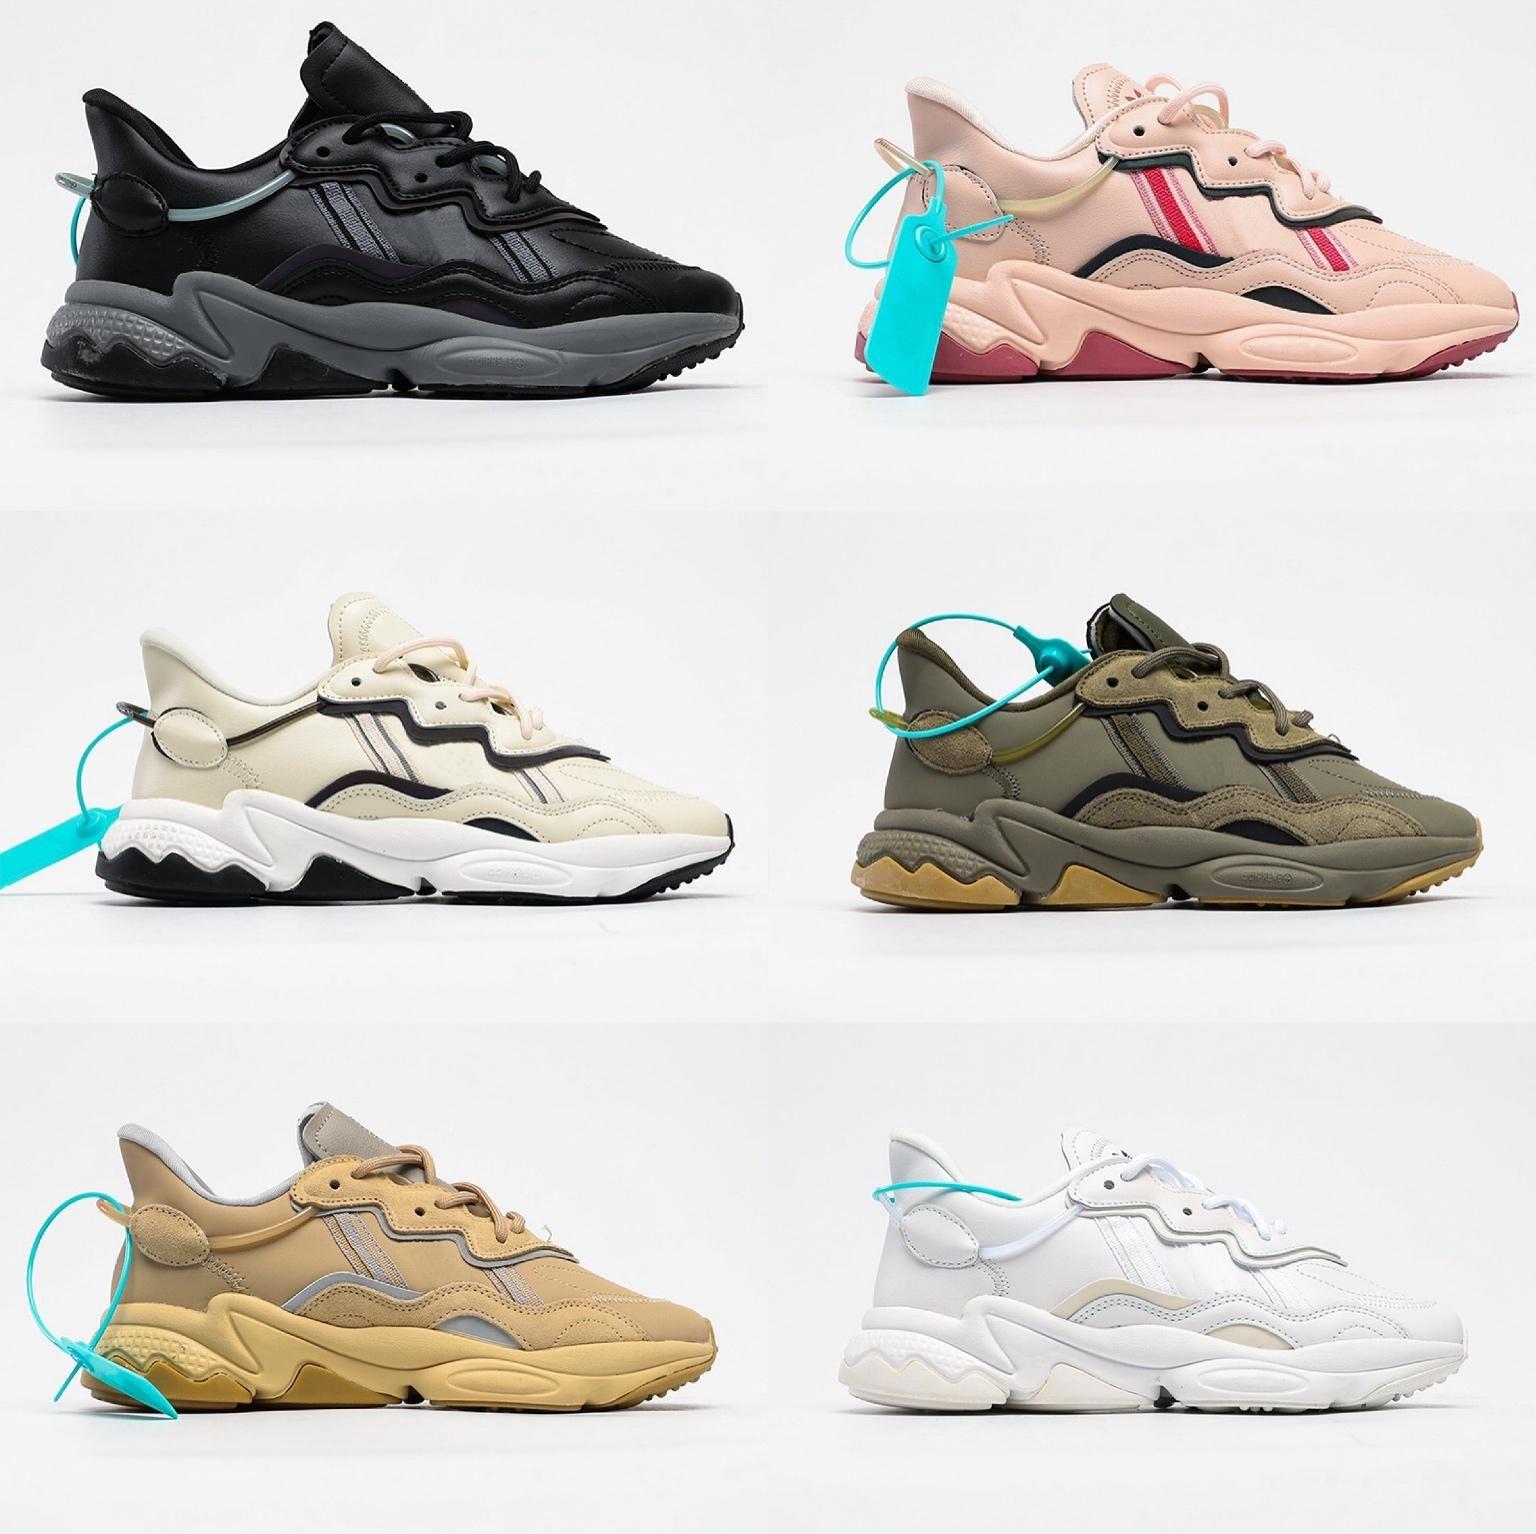 Kanye West MNVN Asriel V2 Desert Sage Lin Marsh Israfil Oreo Yeshaya Yecheil réfléchissant Hommes Femmes Chaussures de course Baskets de sport Chaussures de sport